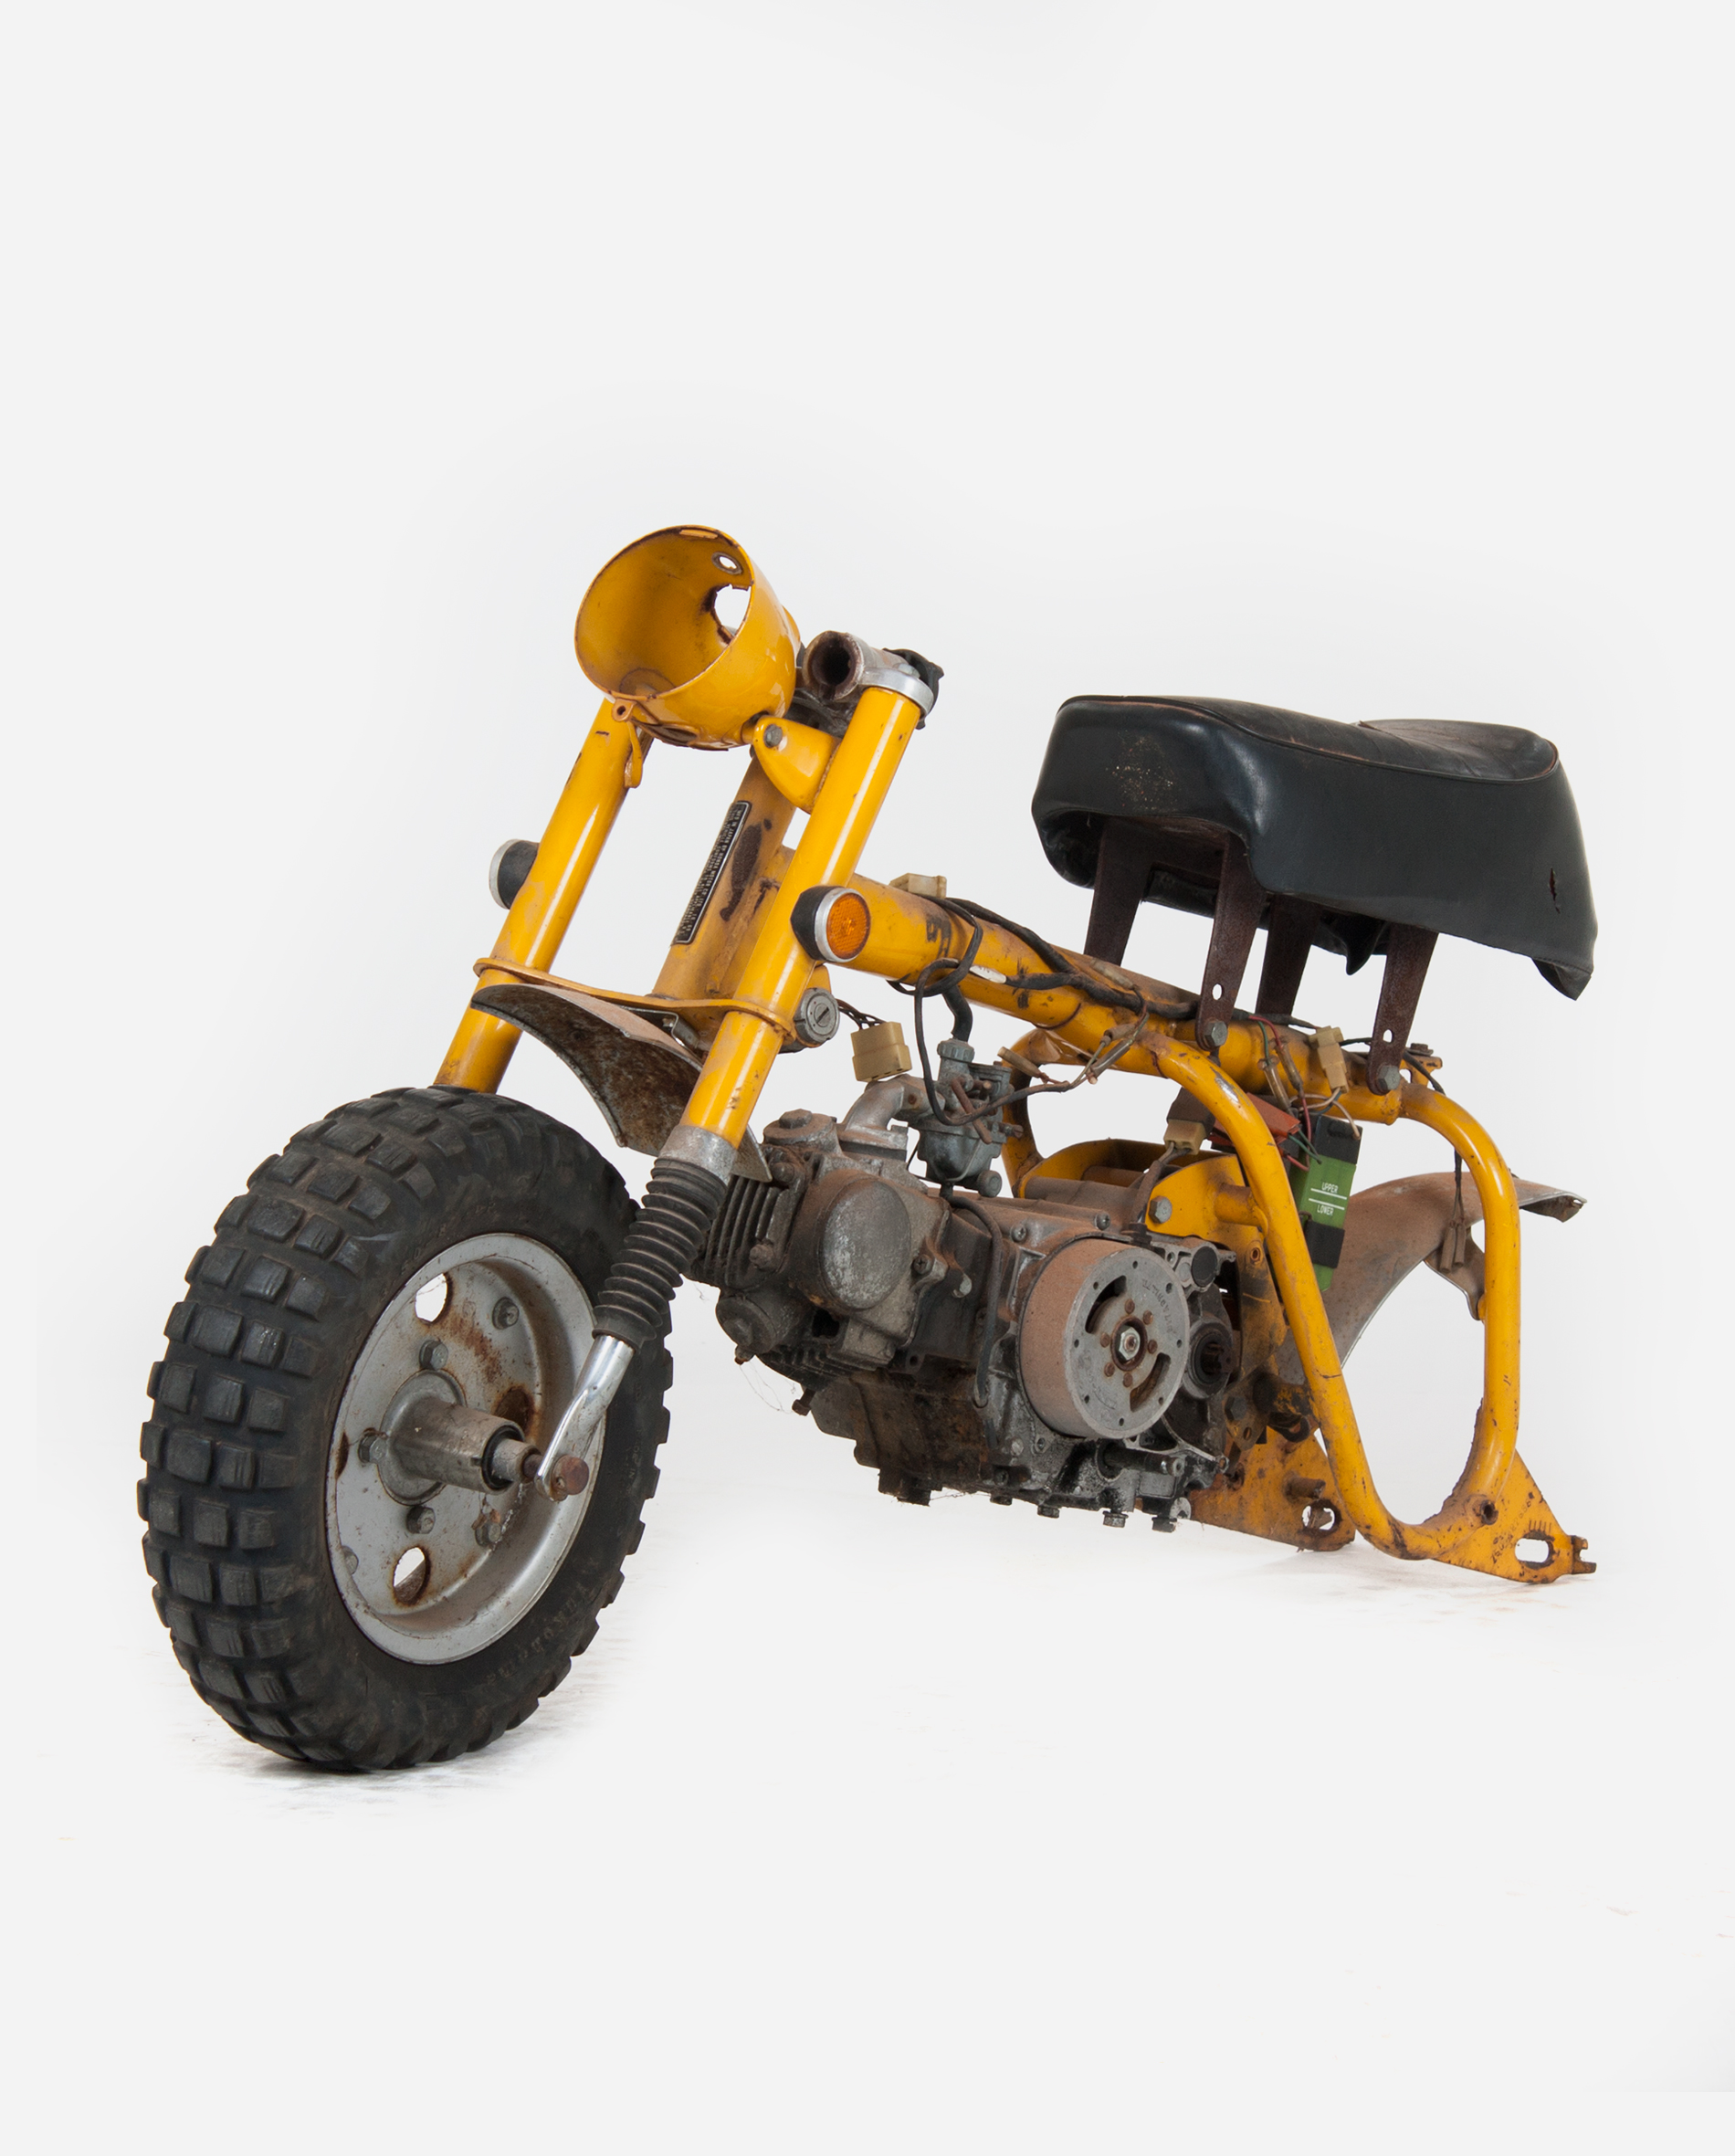 Honda-monkey-z50a-yellow-lv · Fourstrokebarn